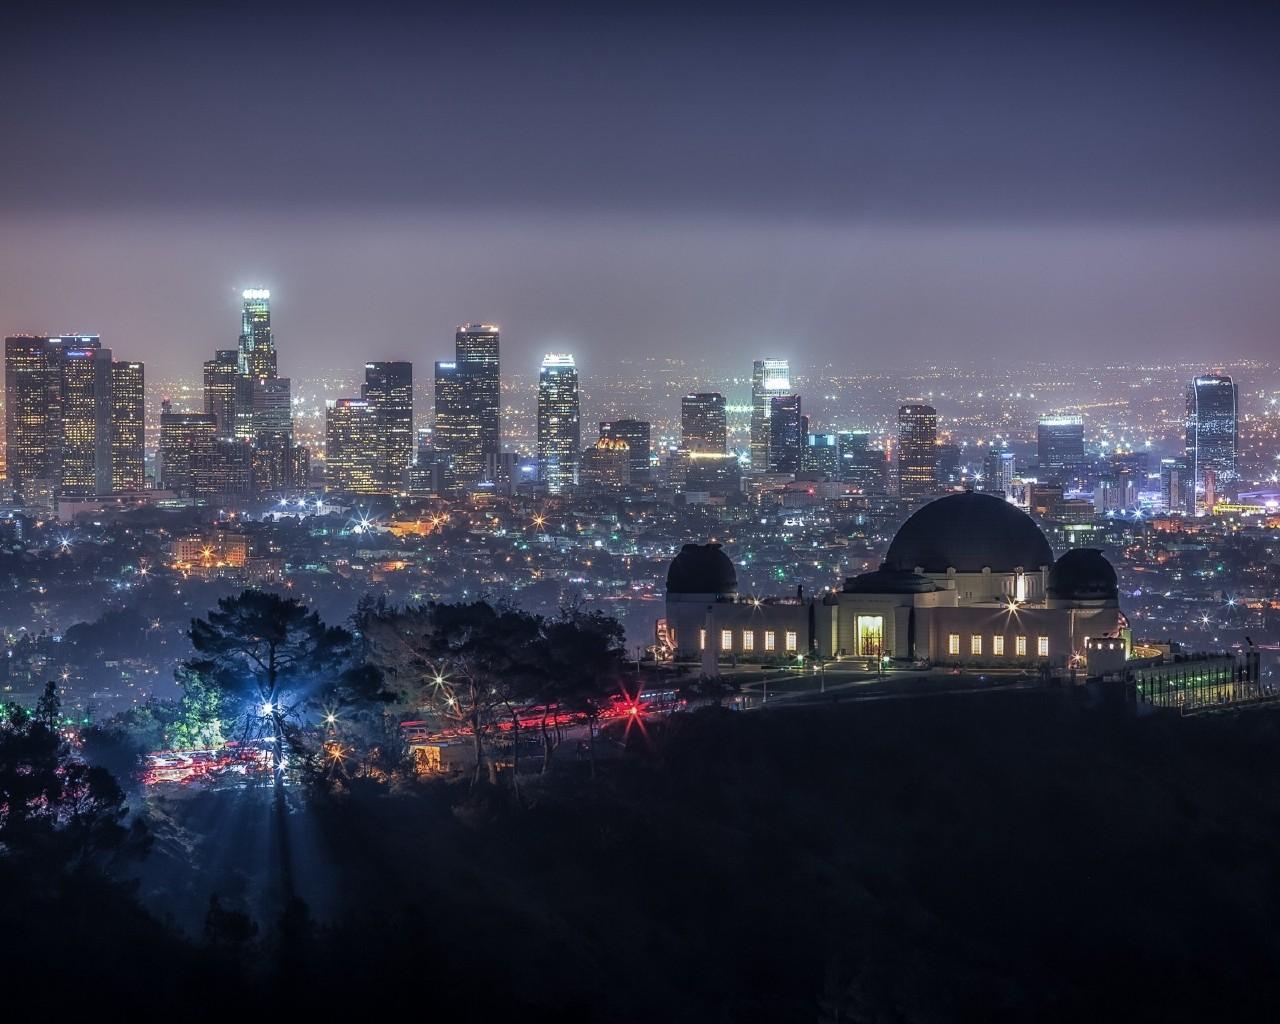 Wallpaper California Griffith Park Usa World PicsFabcom 1280x1024